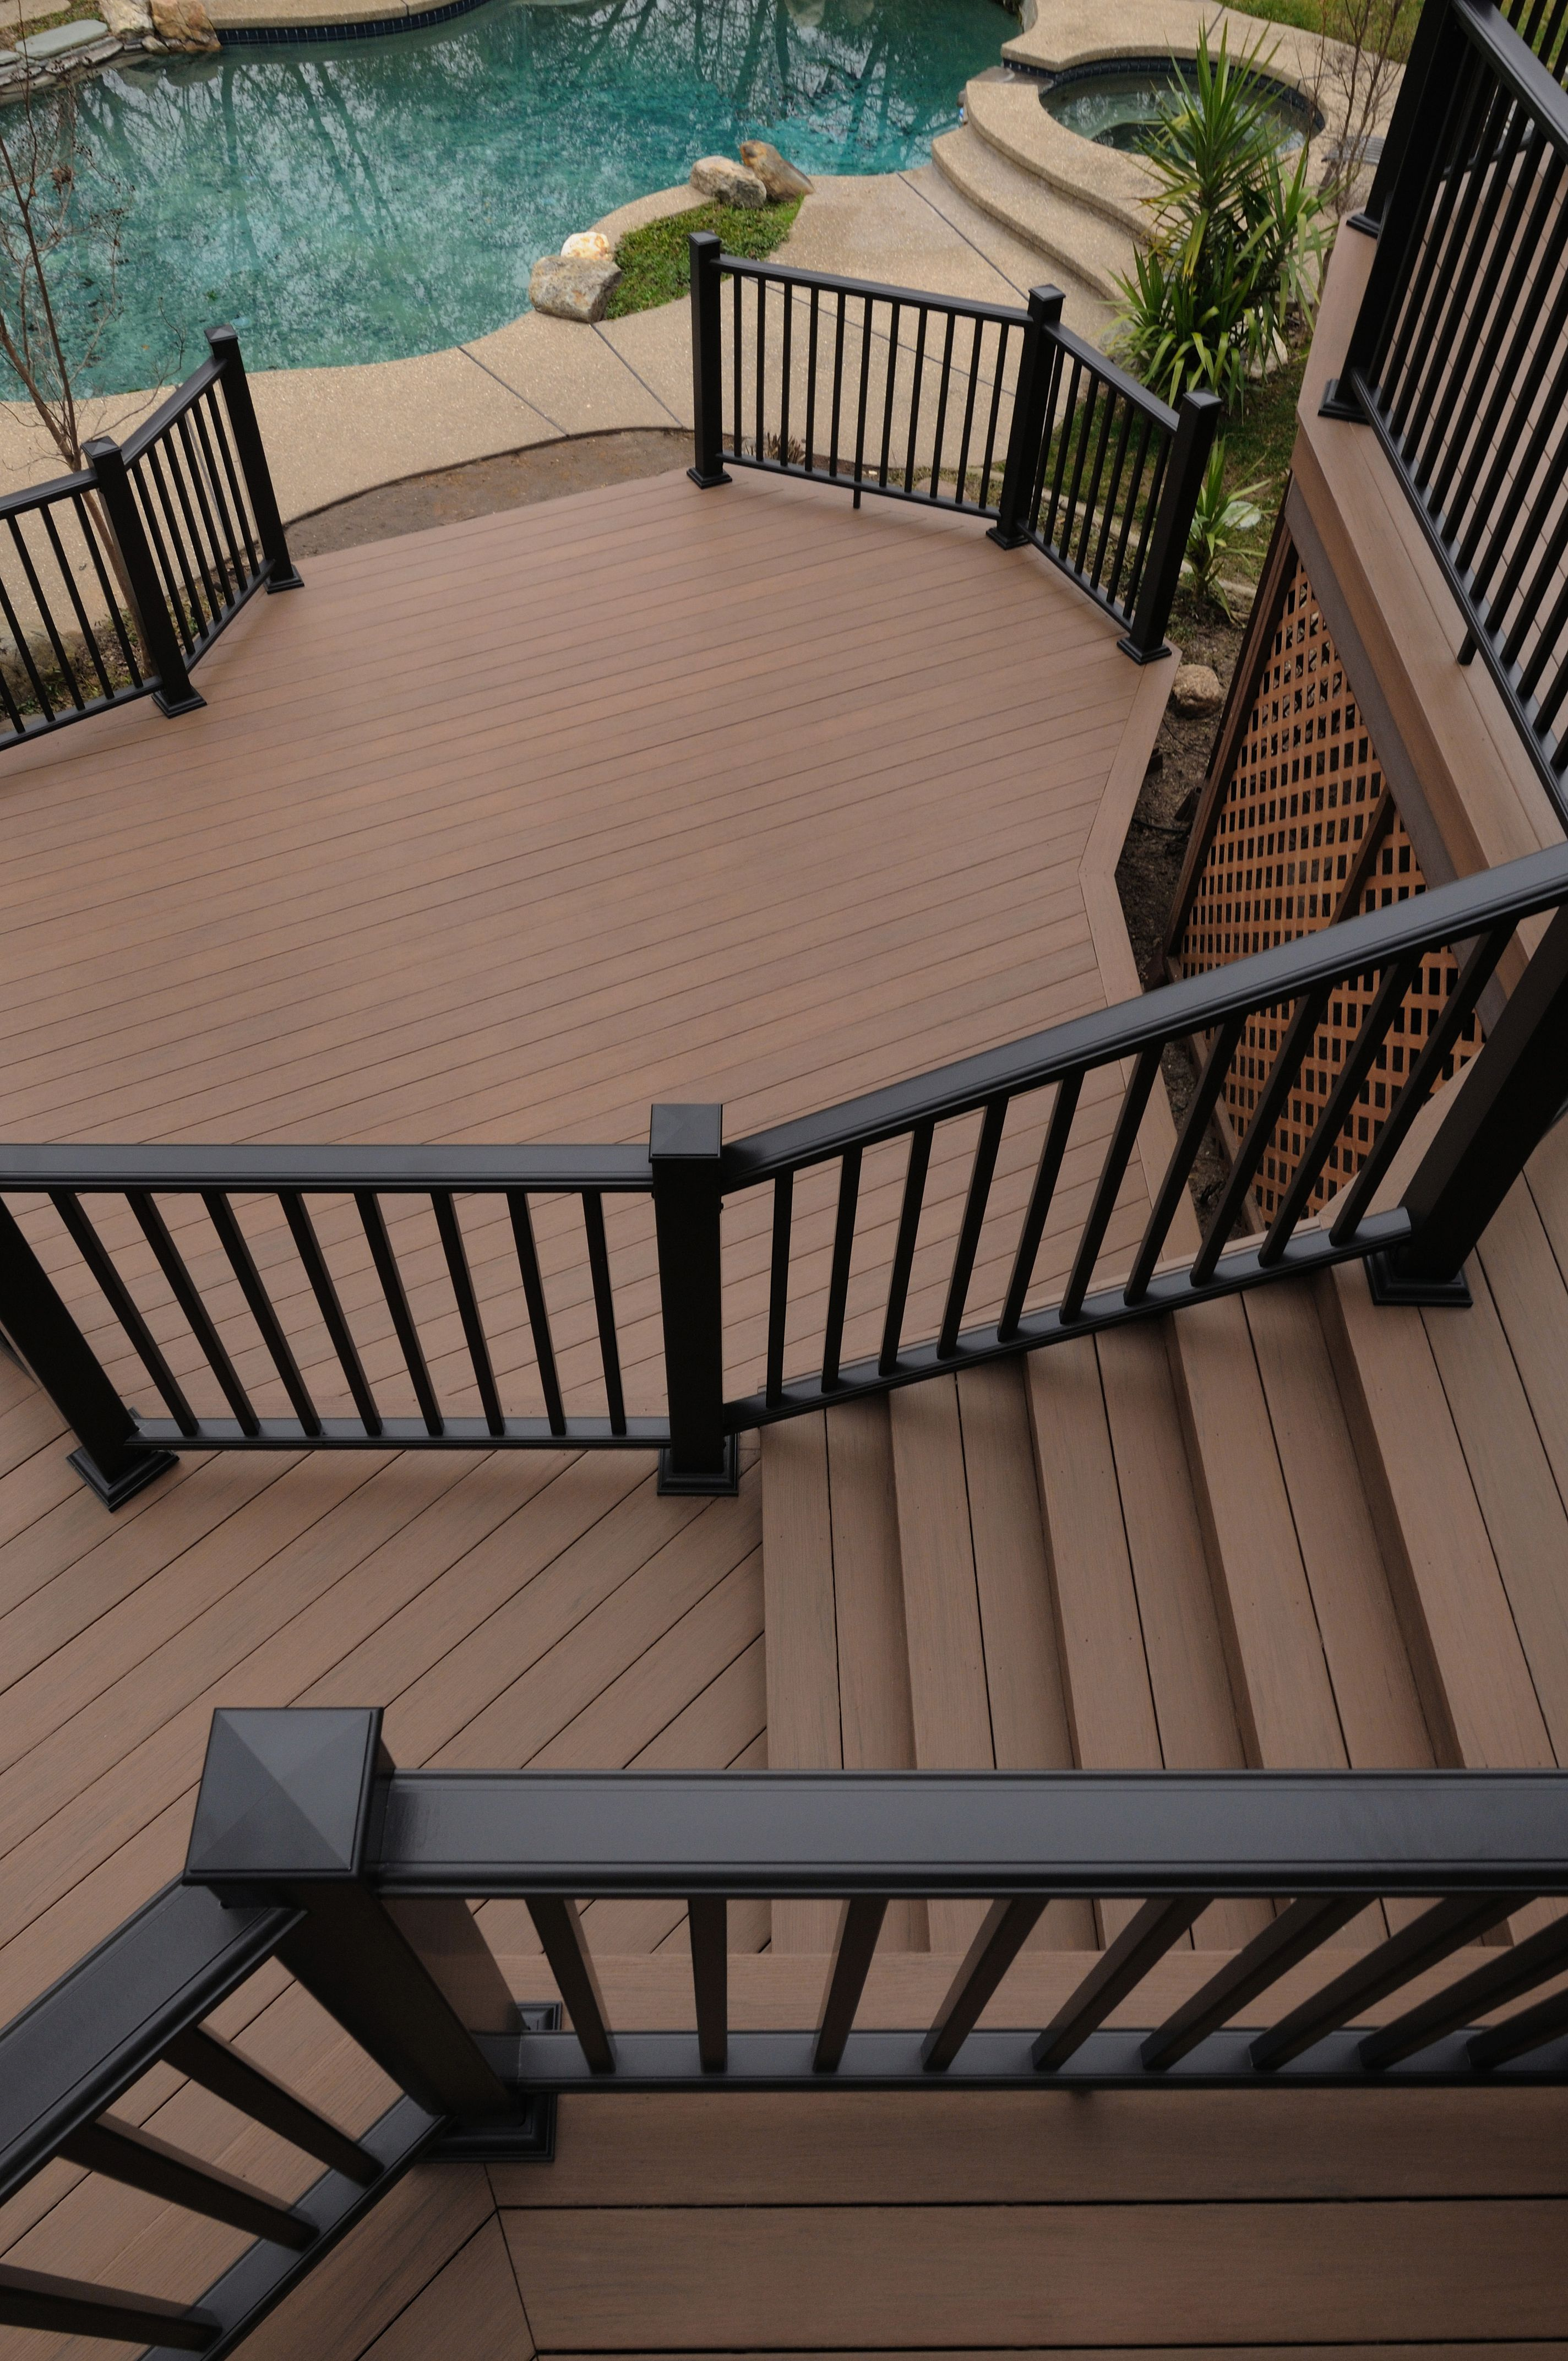 Azek Morado Deck Rail Diy Deck Deck Railings Deck Design